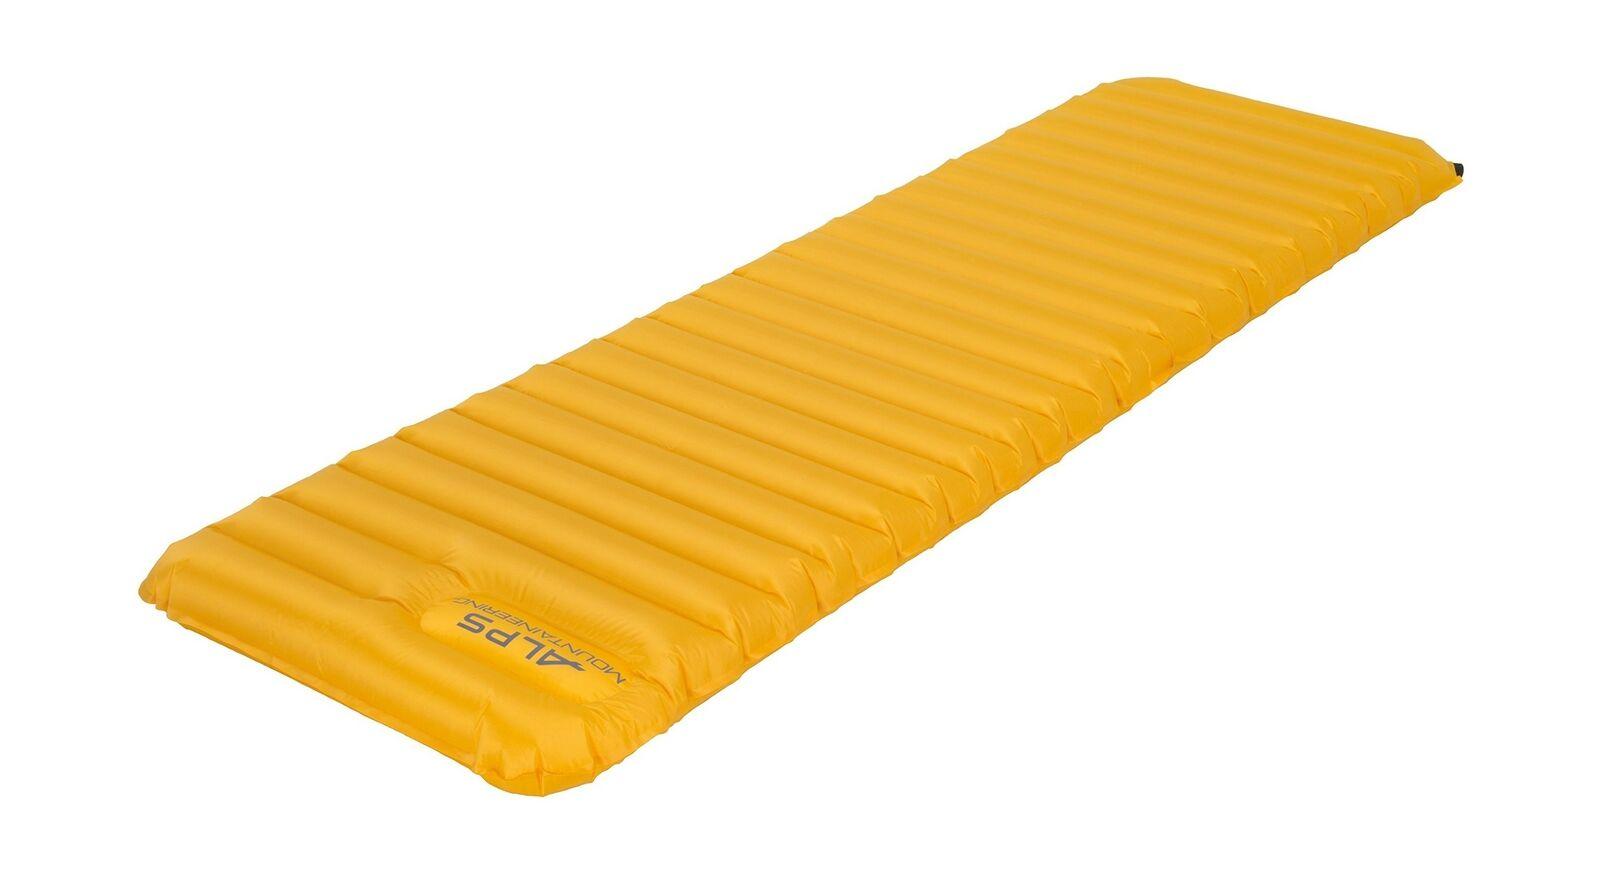 ALPS Mountaineebague Featherlite Series Air Pad Long or